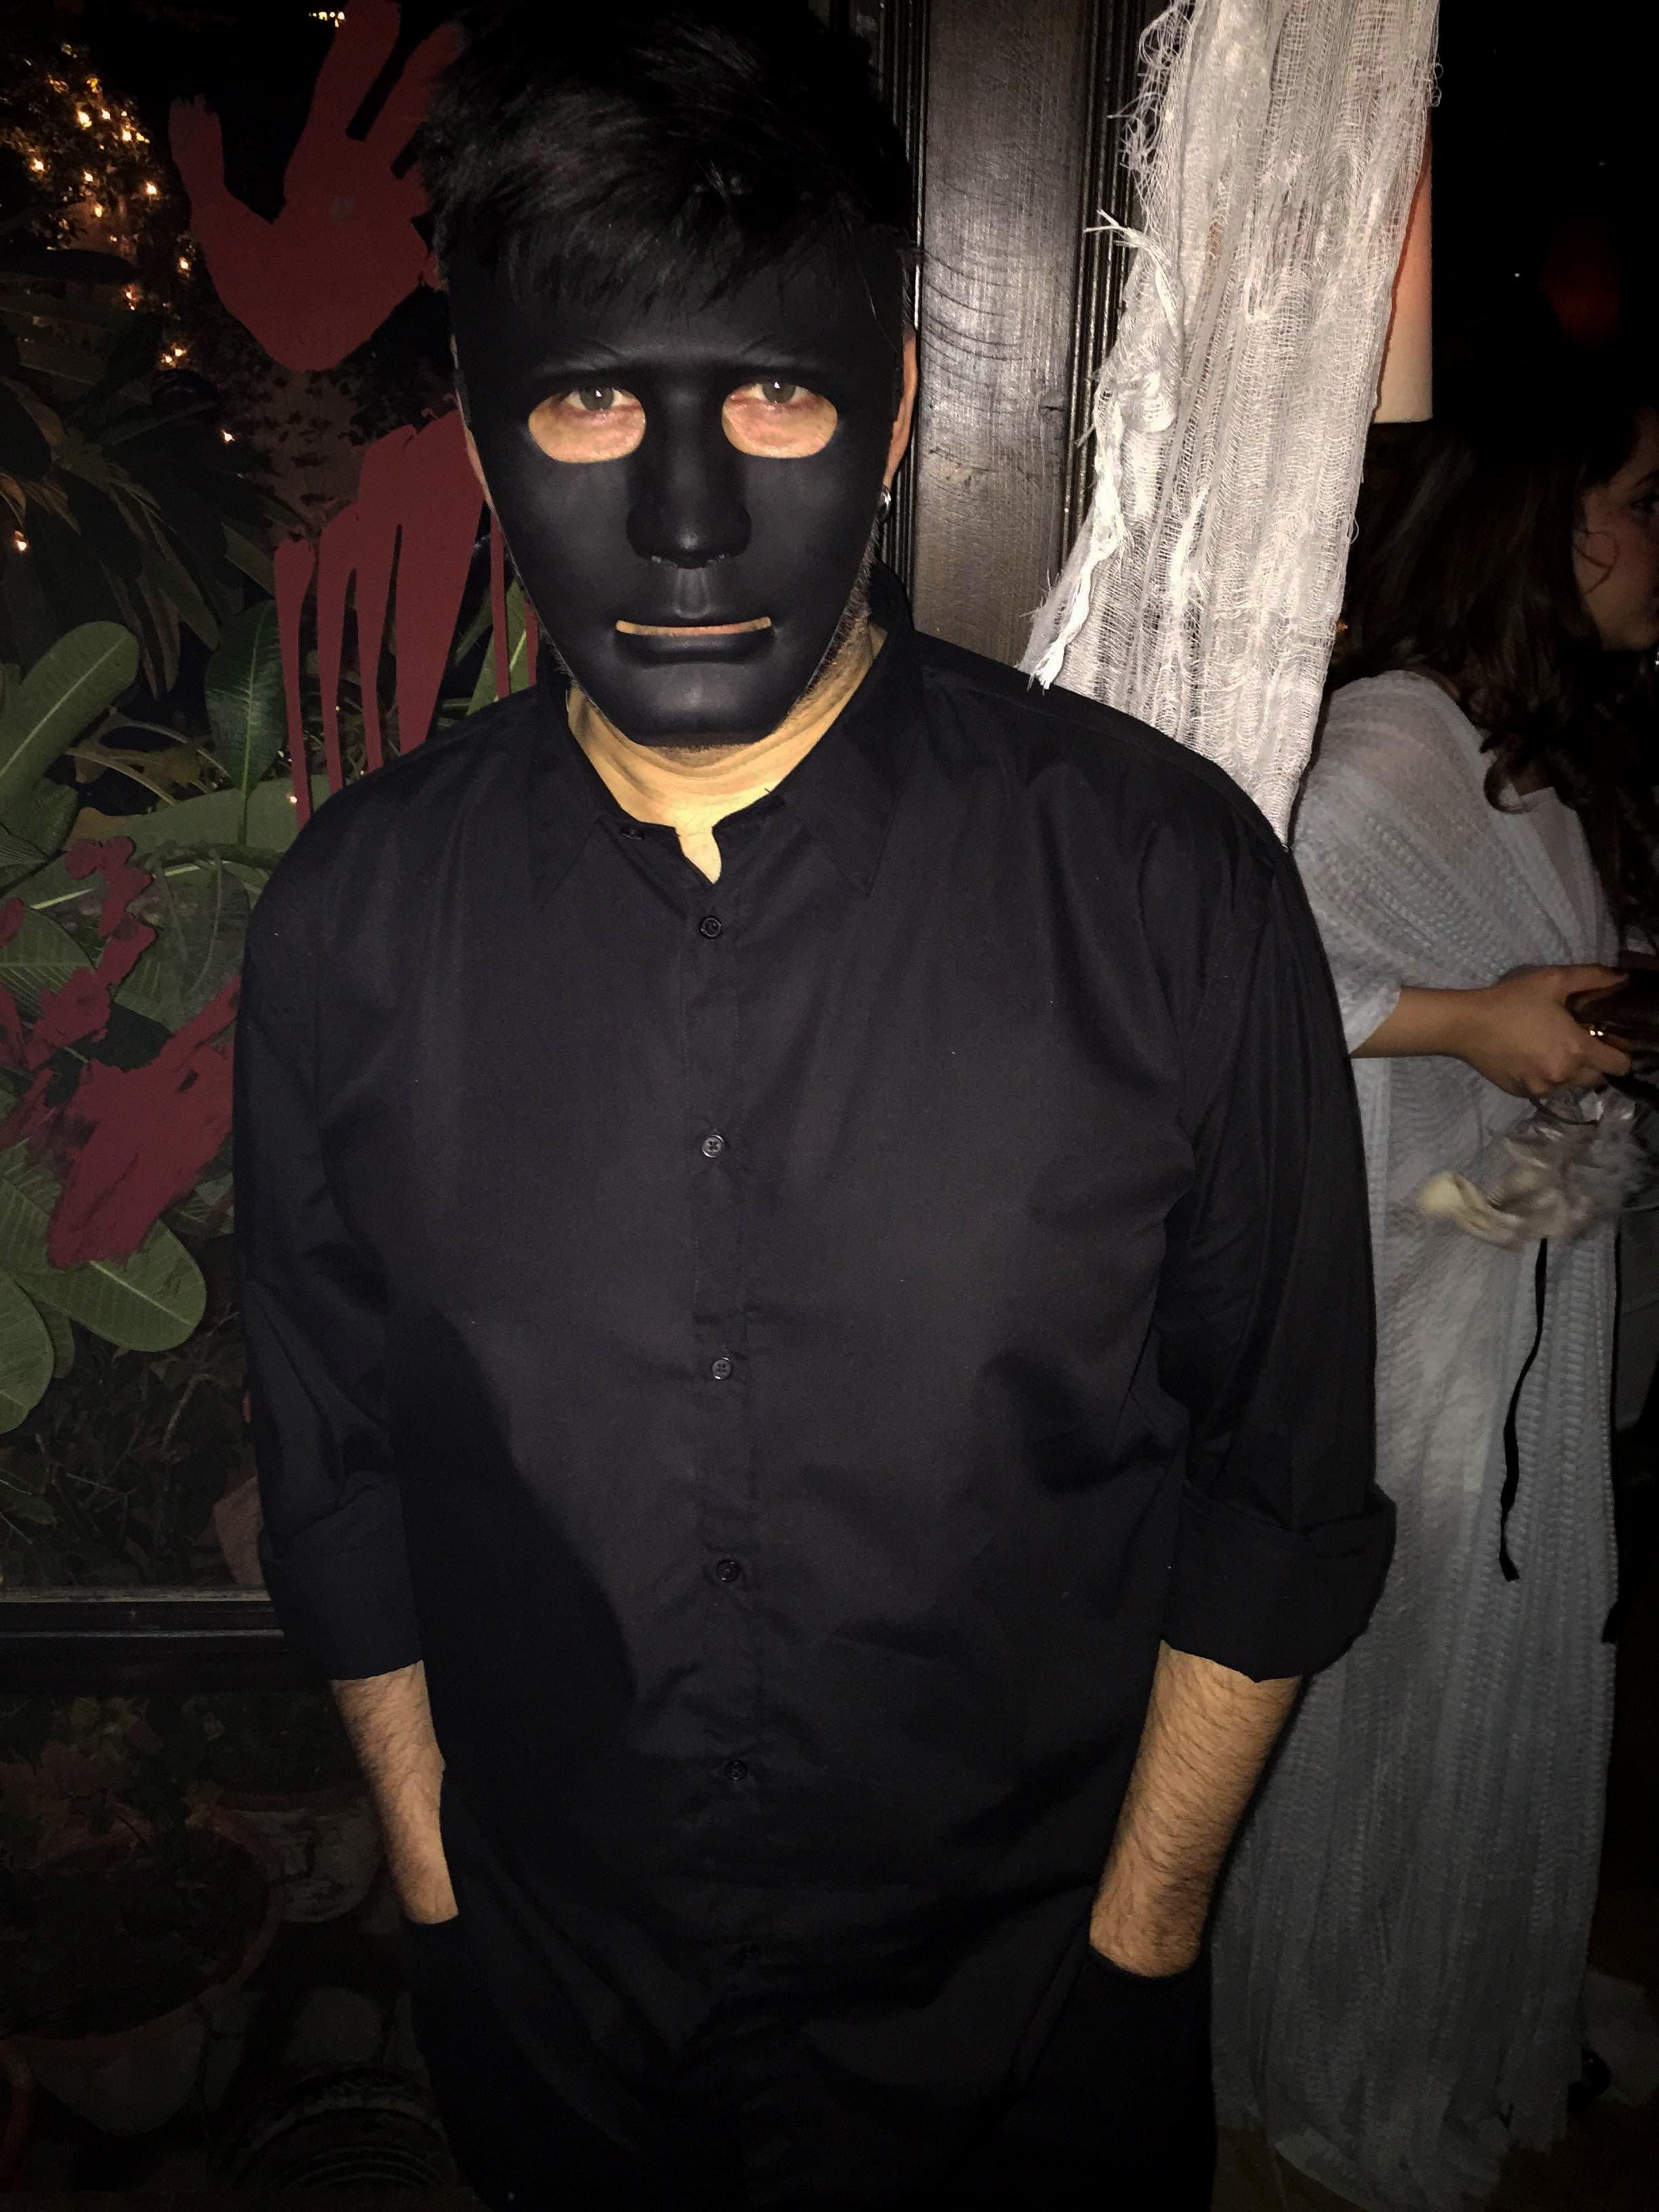 Tapu Javeri paints it black